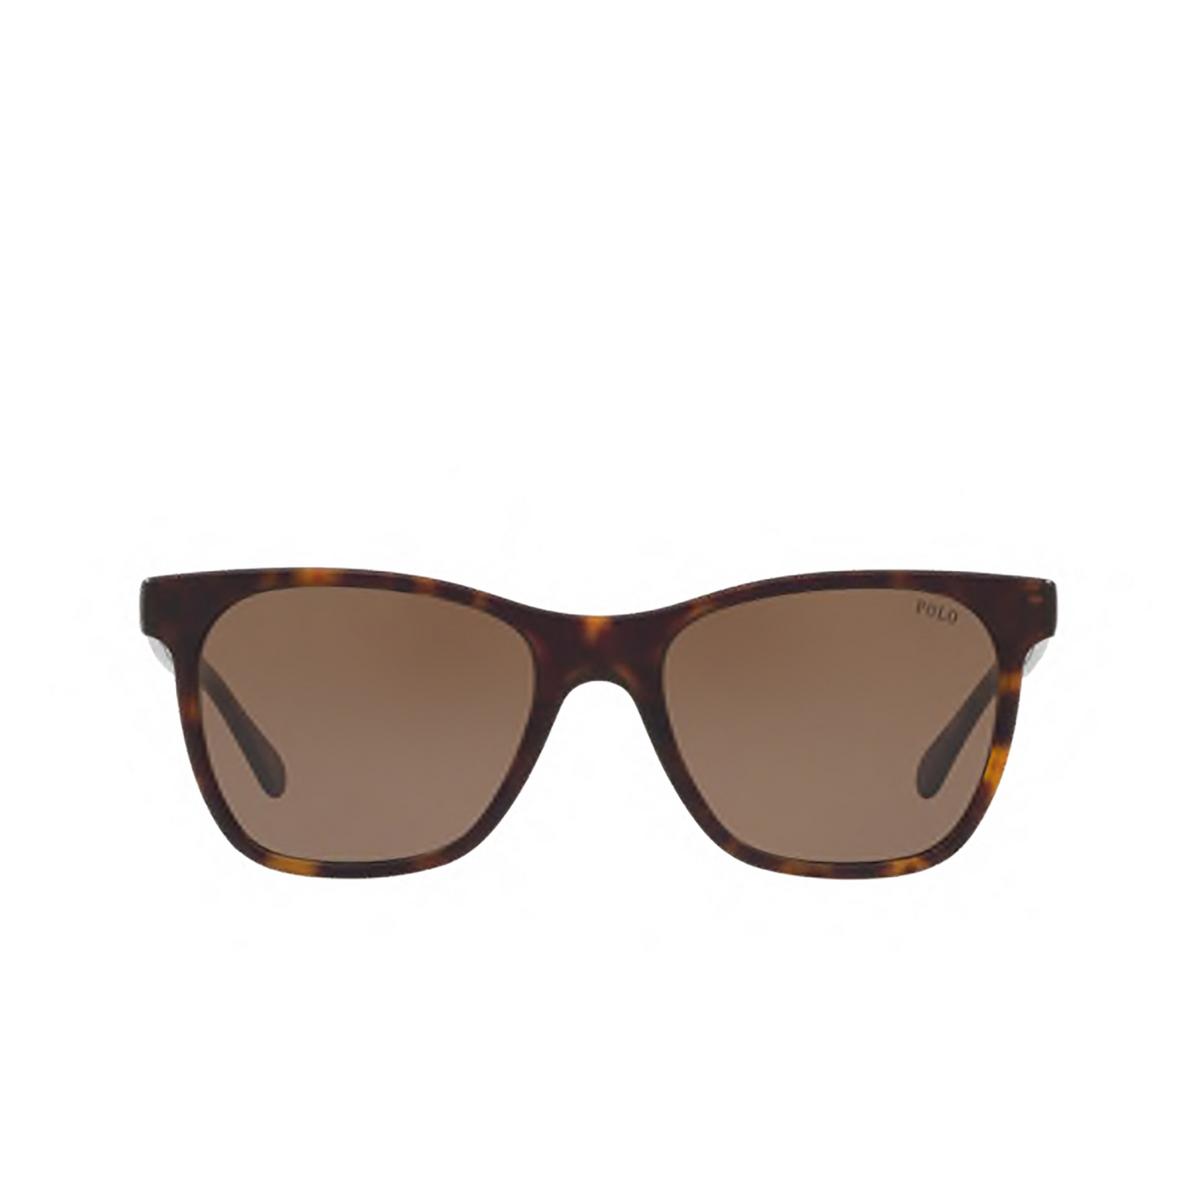 Polo Ralph Lauren® Square Sunglasses: PH4128 color Shiny Vintage Dark Havana 560273.